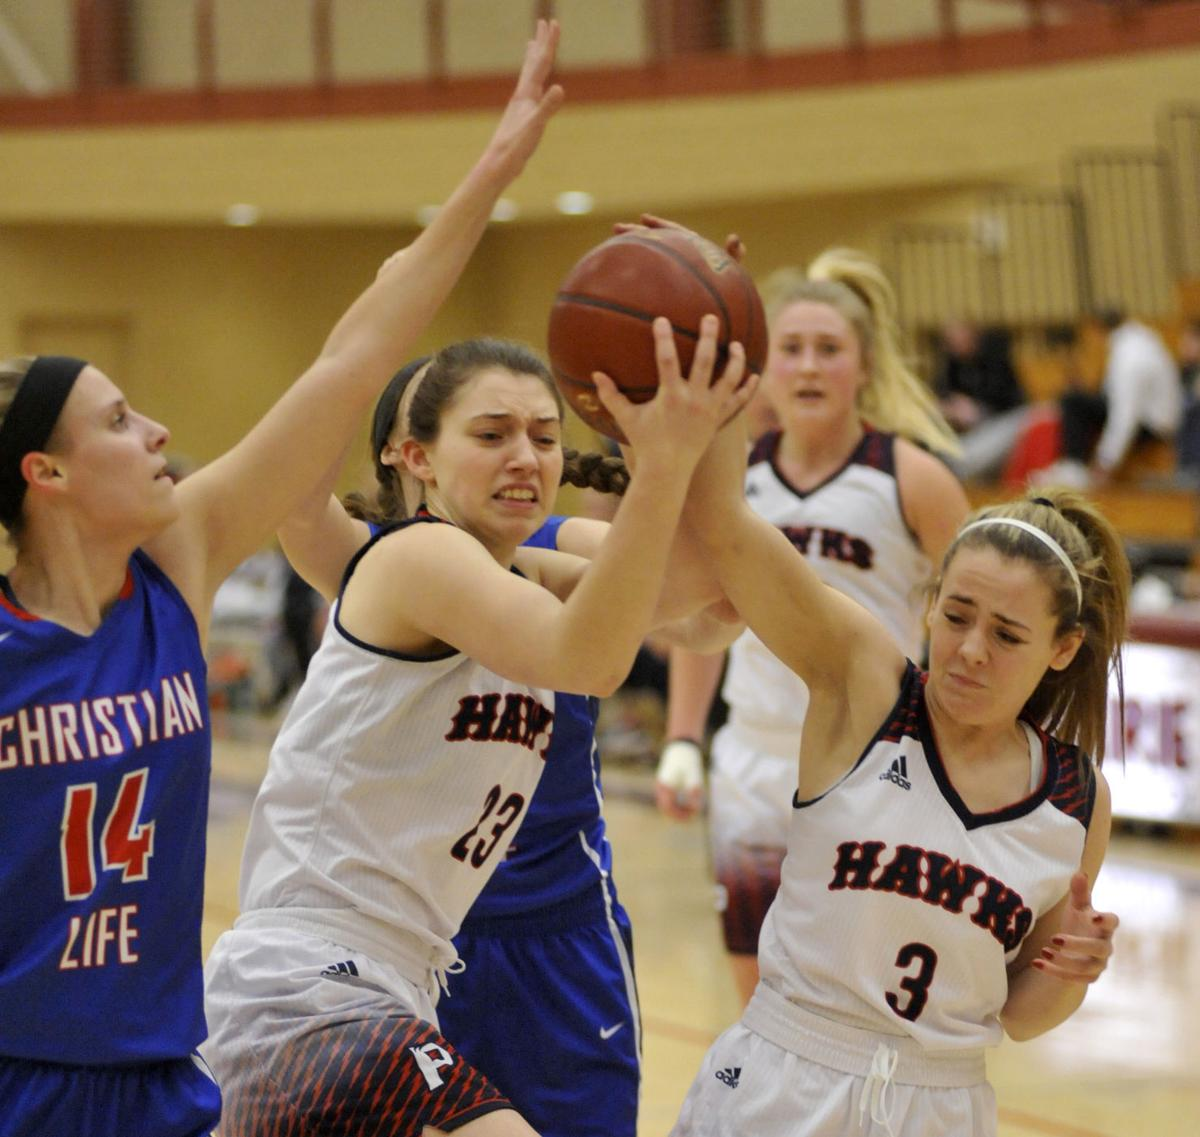 WIAA Division 4 girls basketball